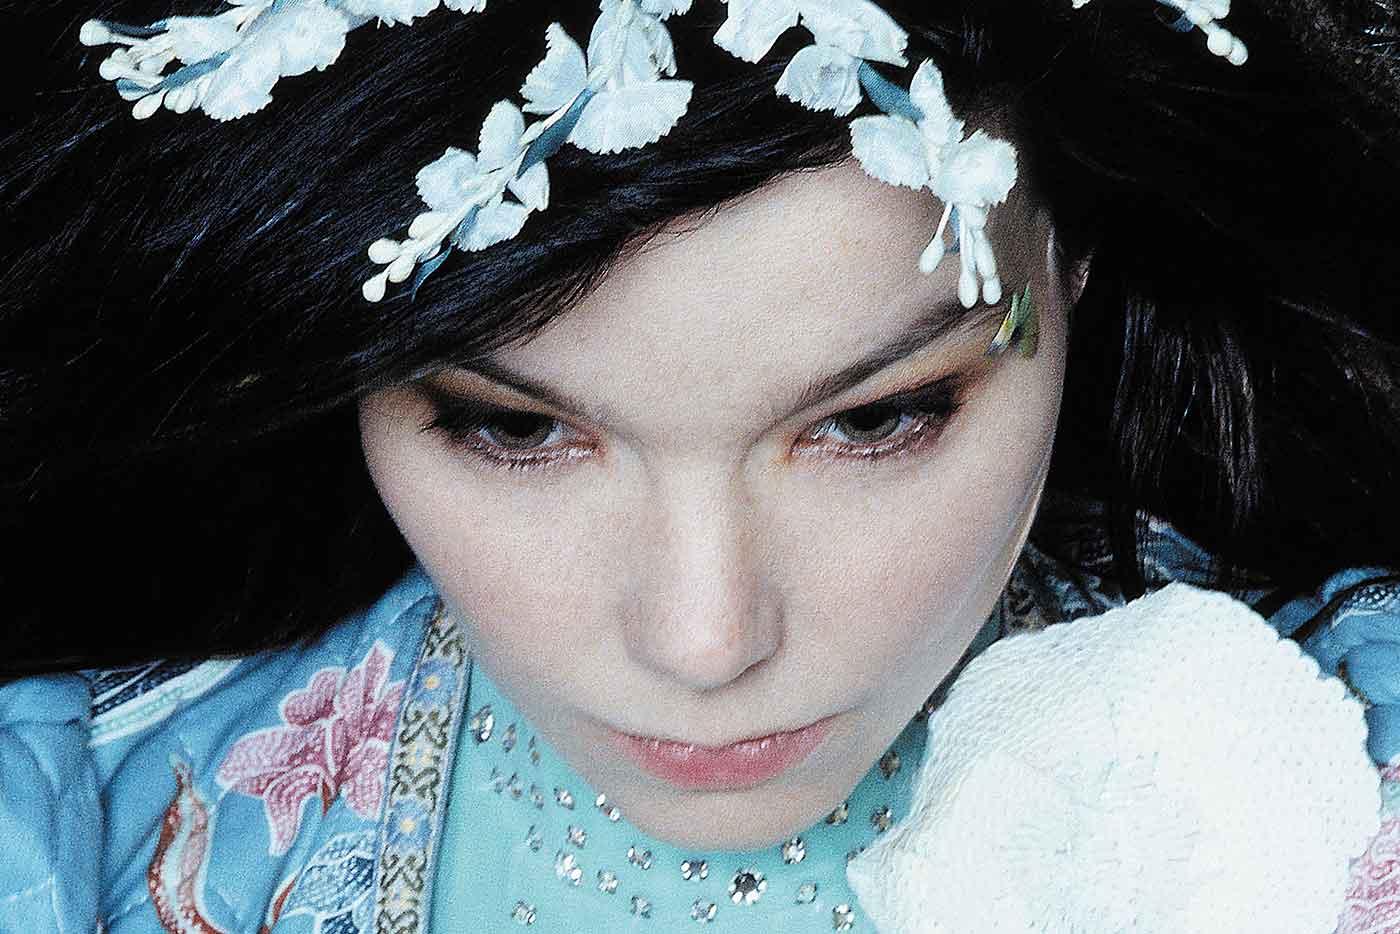 Entrevistas históricas especial 200 – Björk